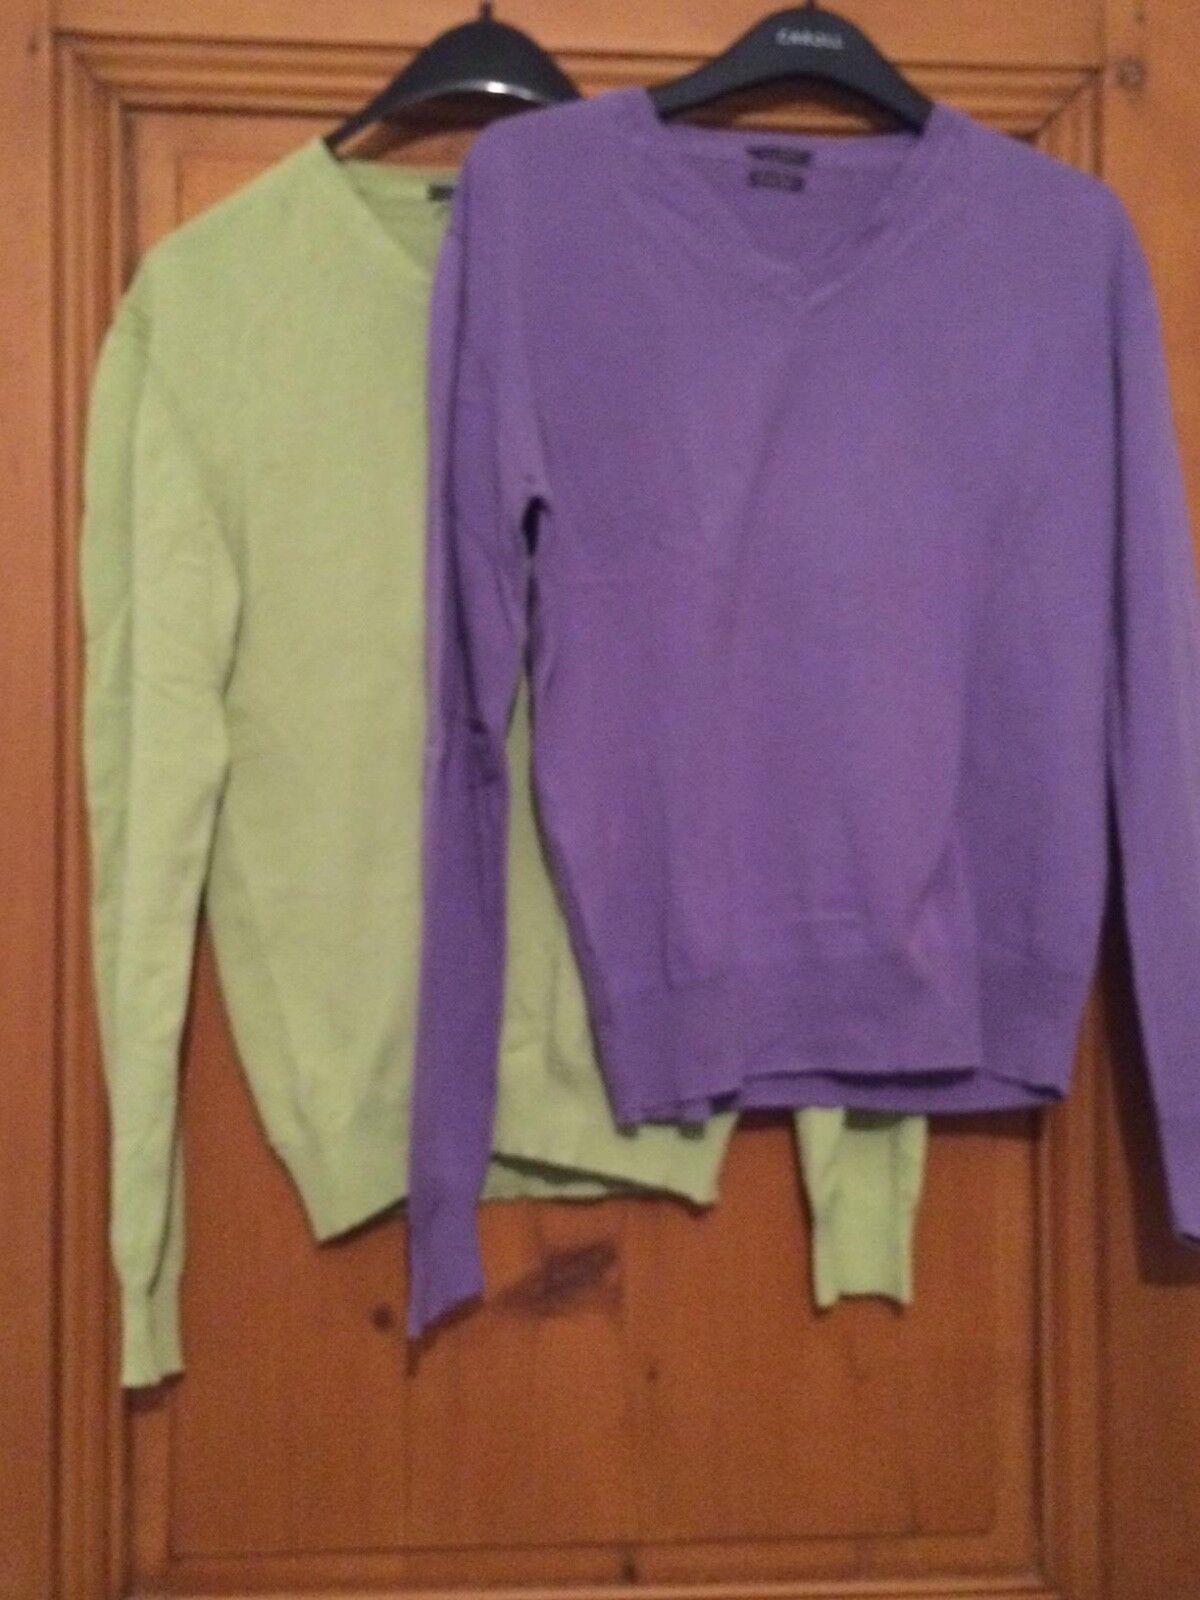 Lot de 2 - pulls homme - vert   violet- DEVRED - 2 T. M 9bc8e9 ... bcd7bec44667